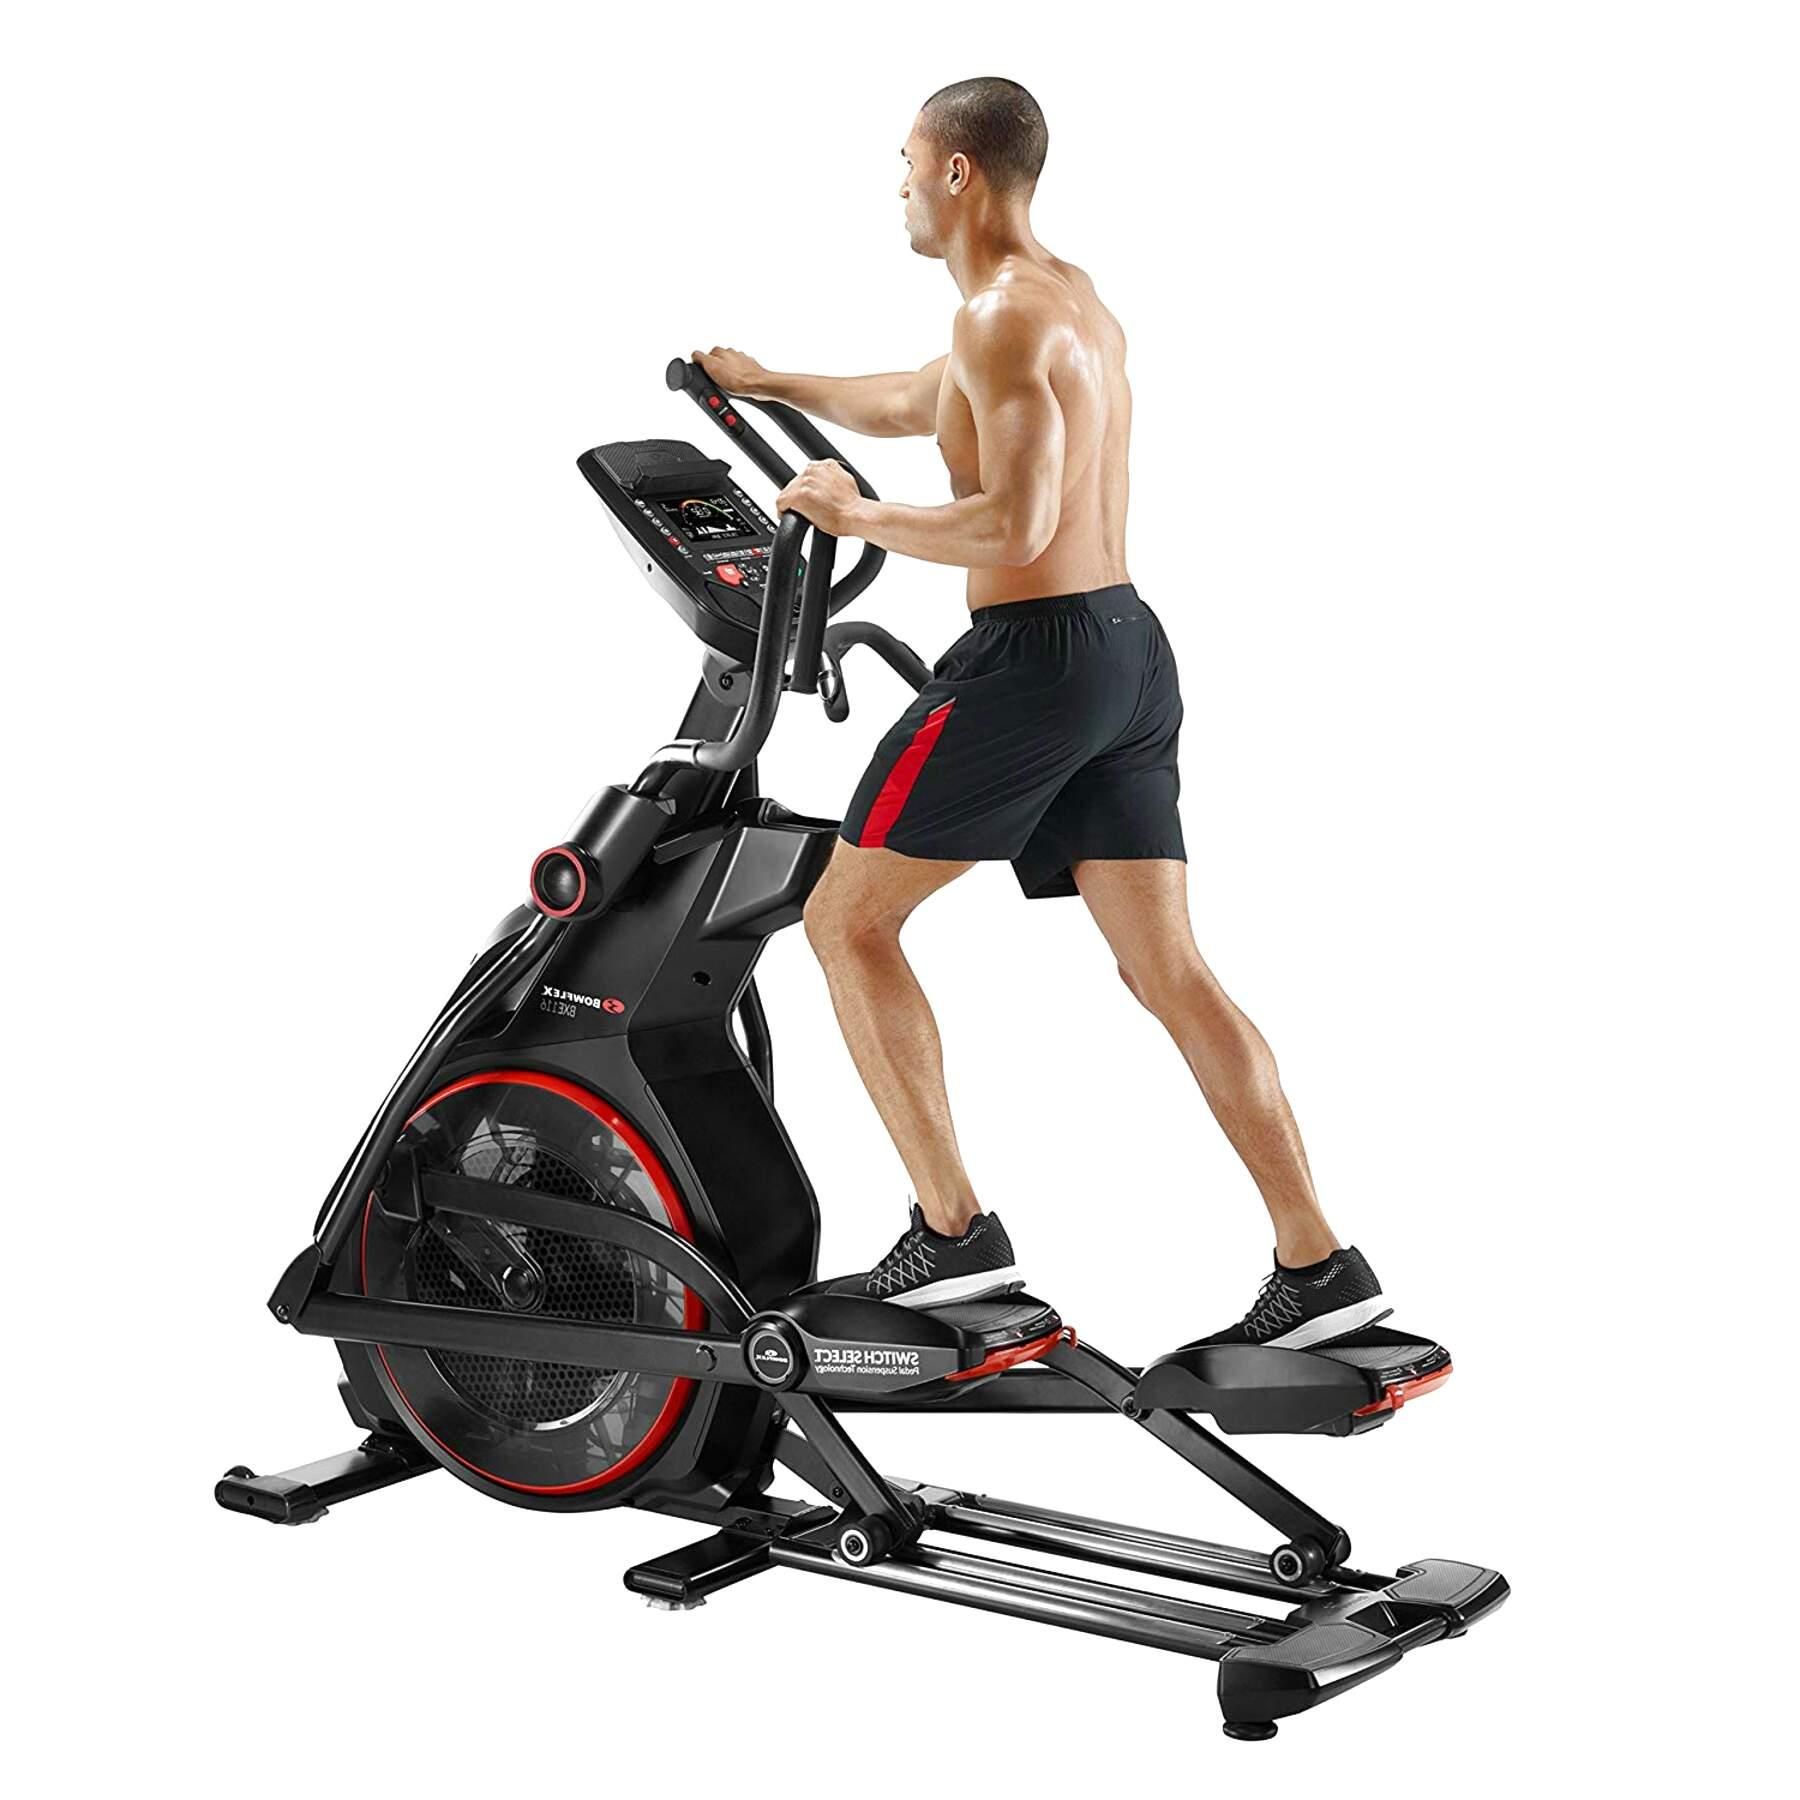 bowflex elliptical for sale